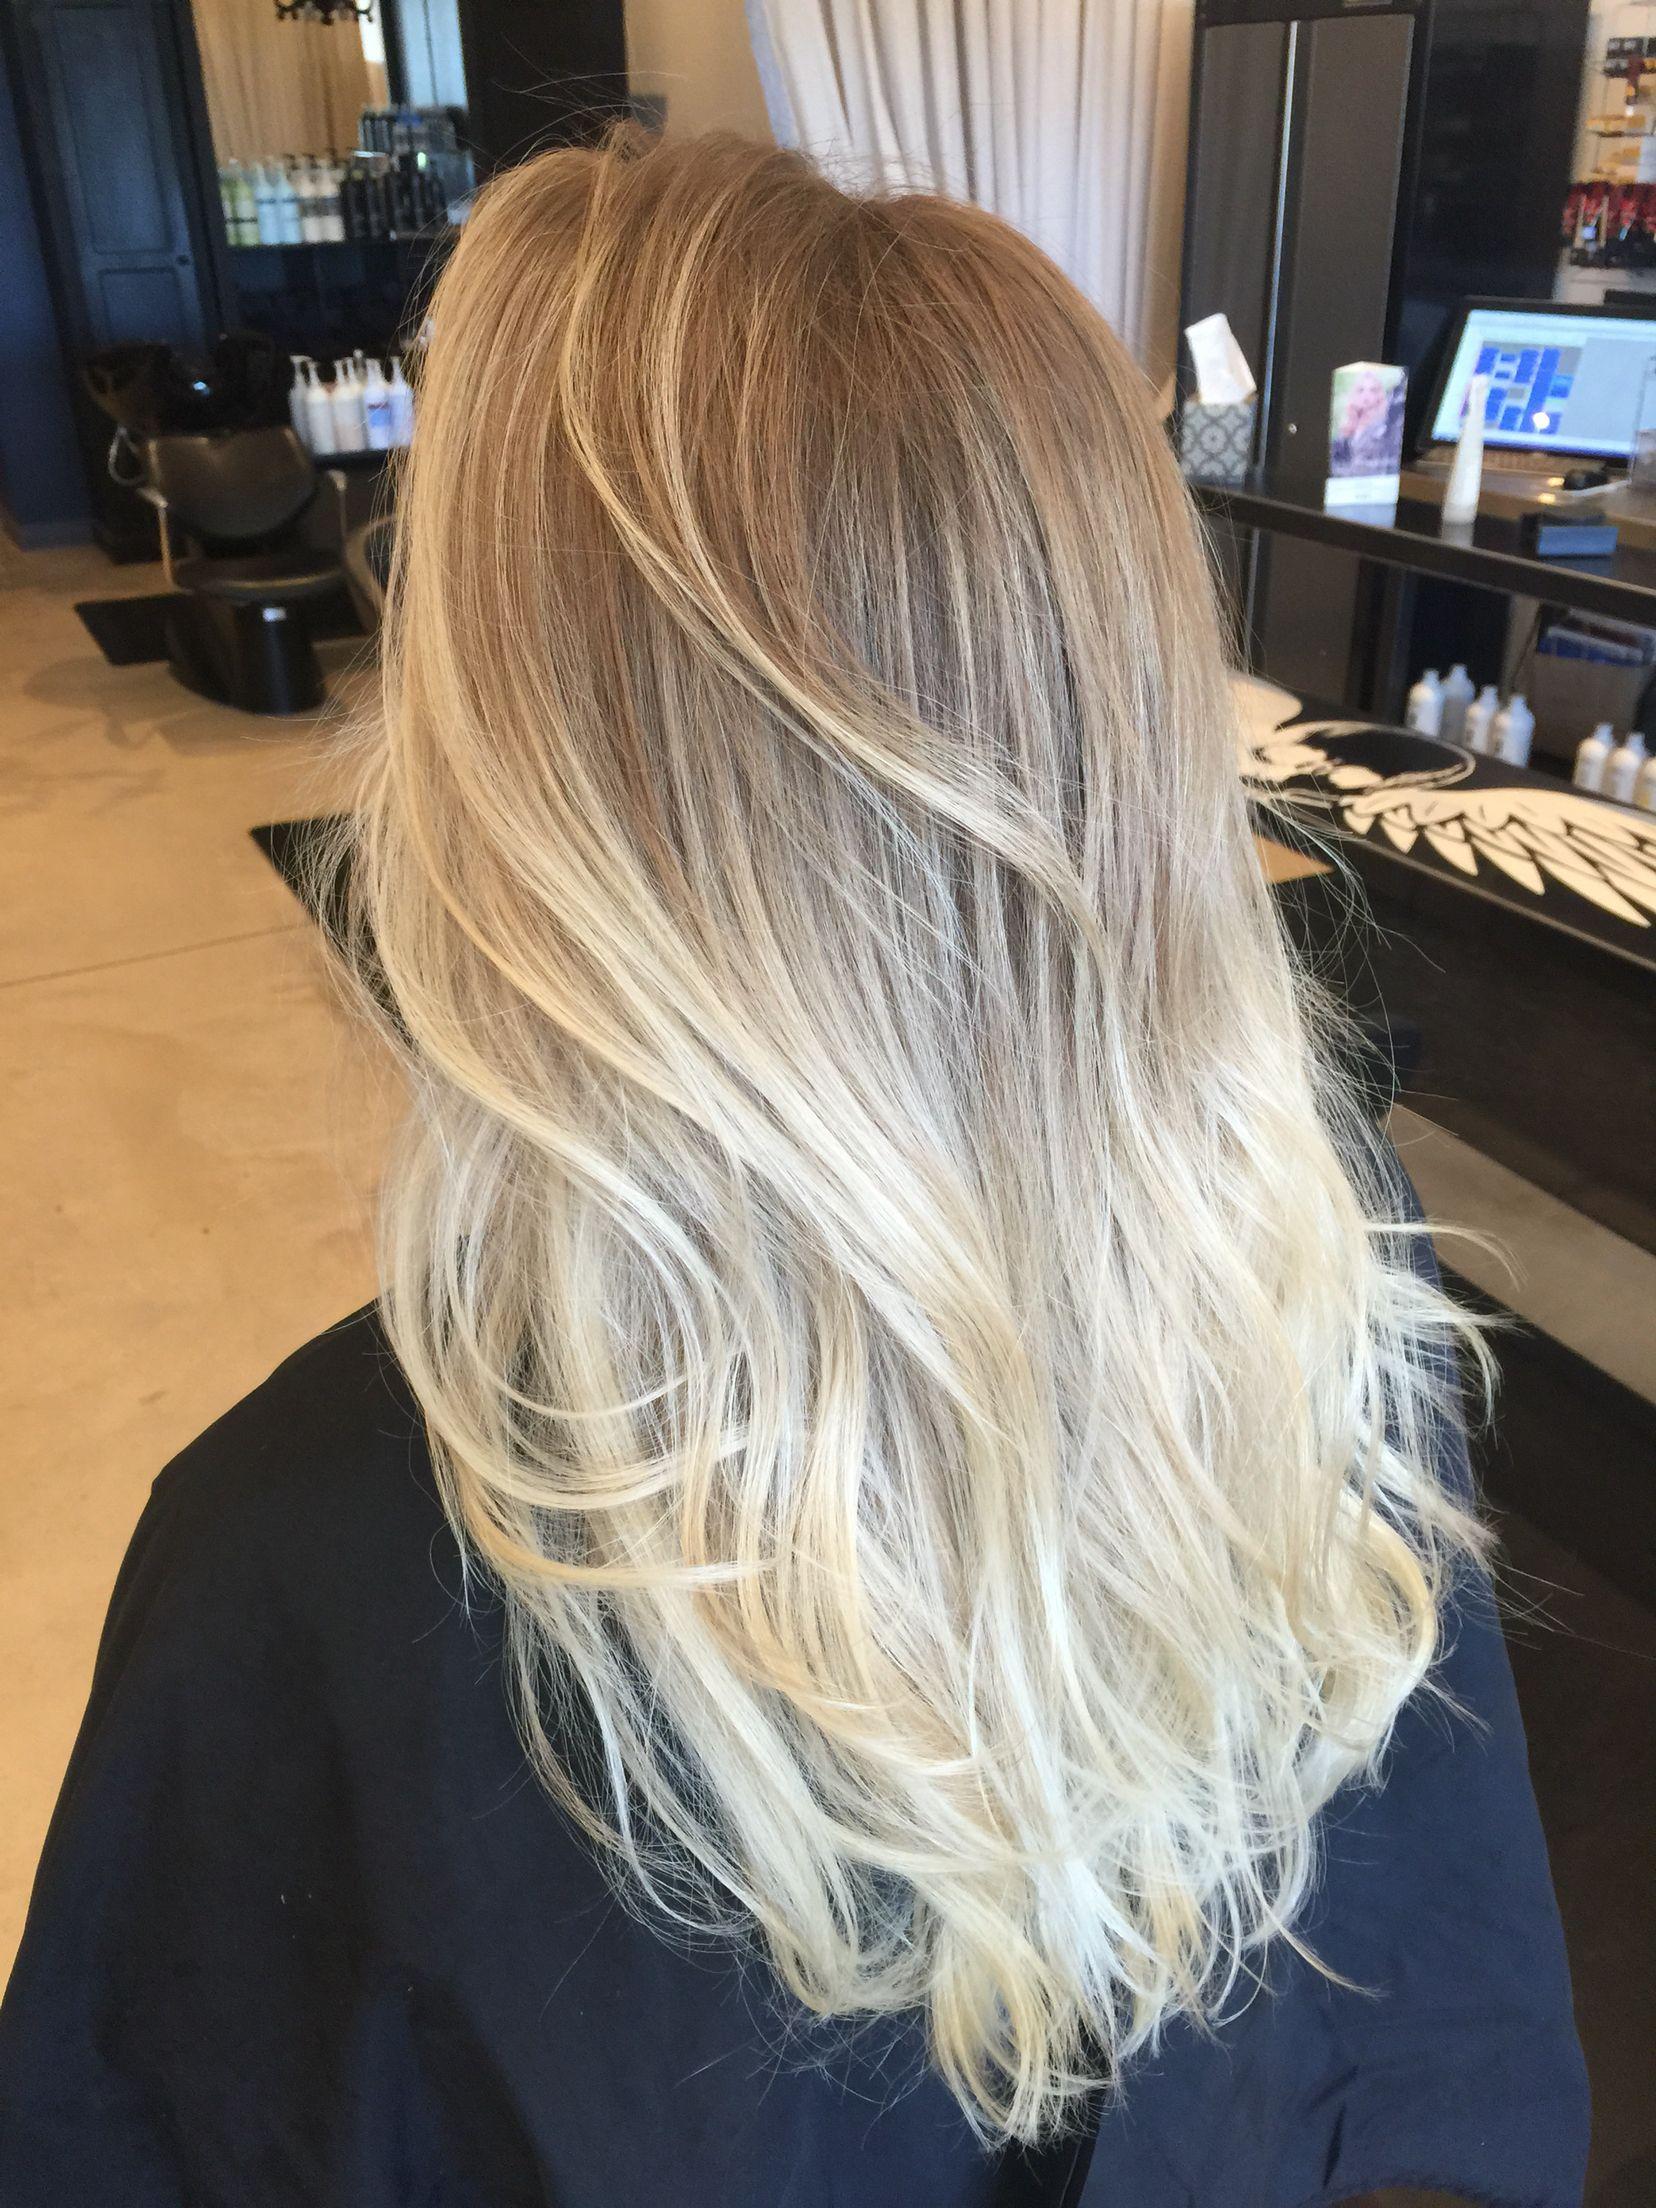 Blonde Hair Ombré Long Hair Ash Blonde Sombre Follow Me On Ig